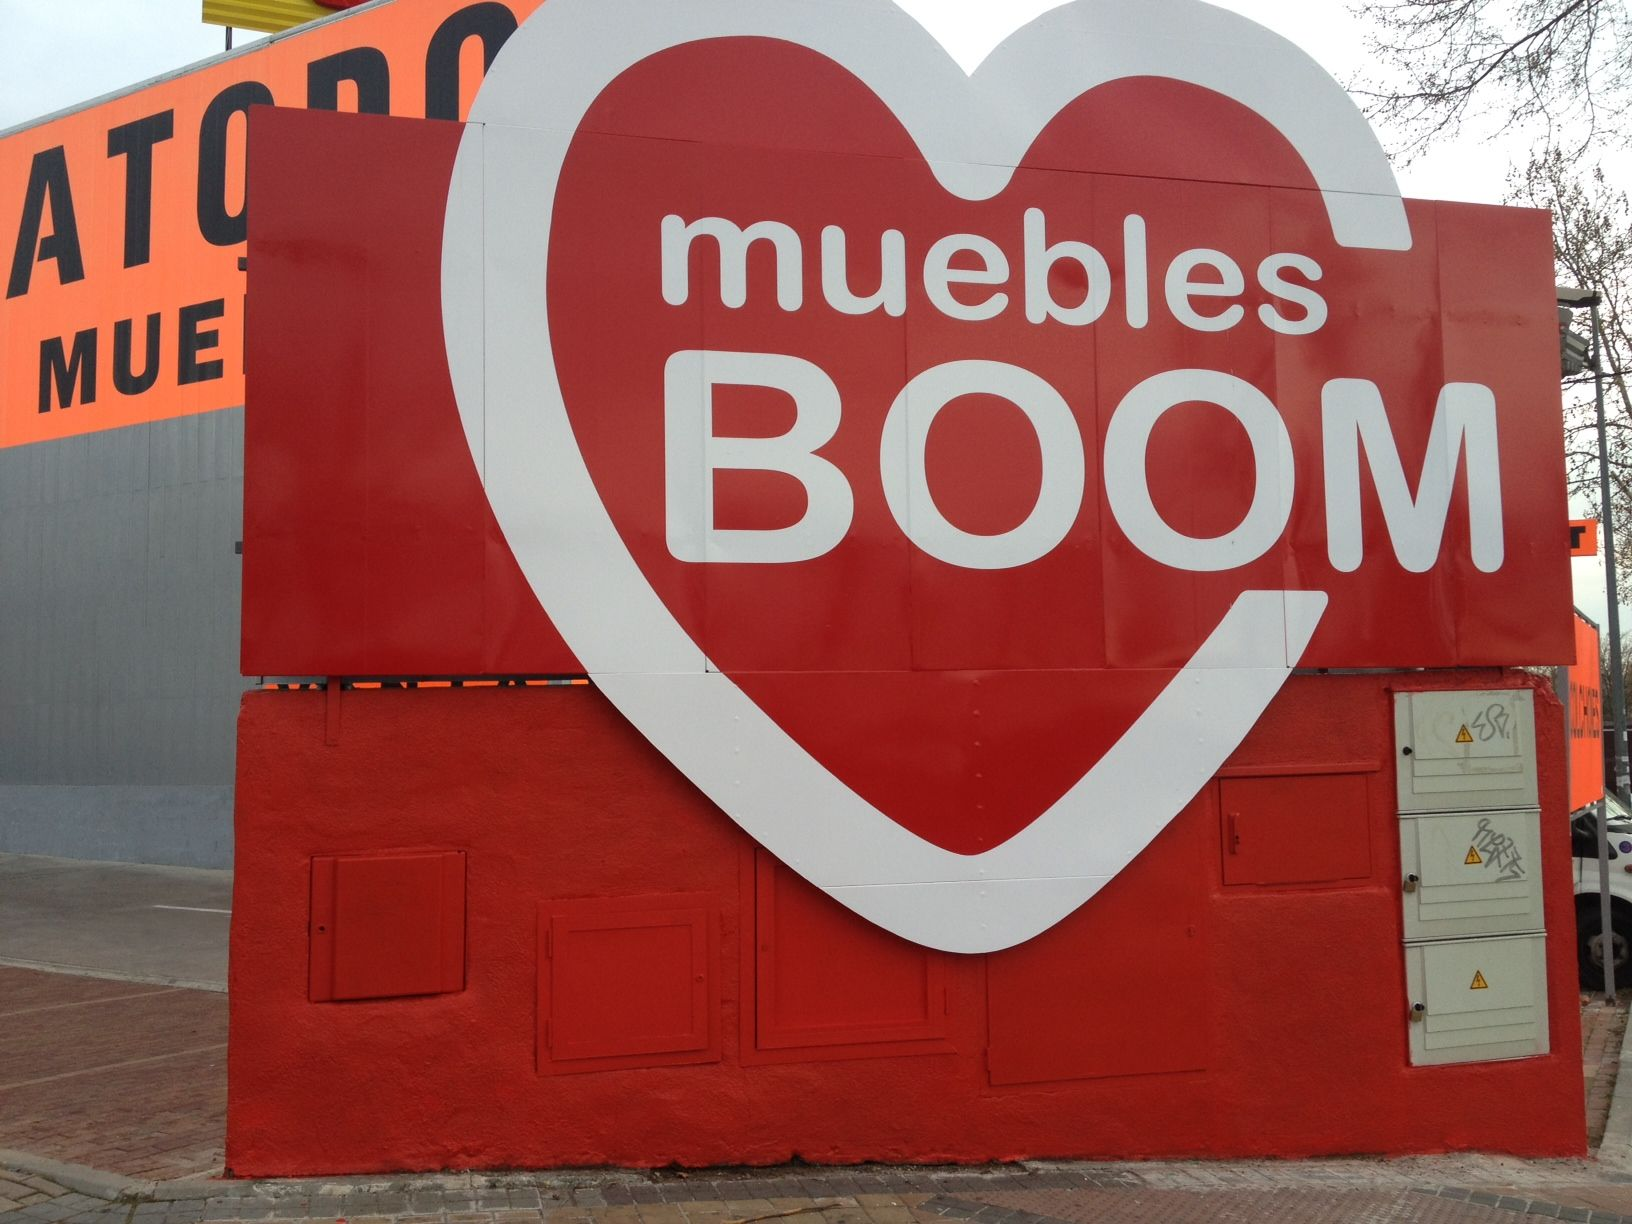 muebles BOOM Alcorcon (Madrid) - C  Luxemburgo 9 junto Worten (P.C. Parque  Oeste) - Tienda Online  www.mueblesboom.com 36bc9036a8abe